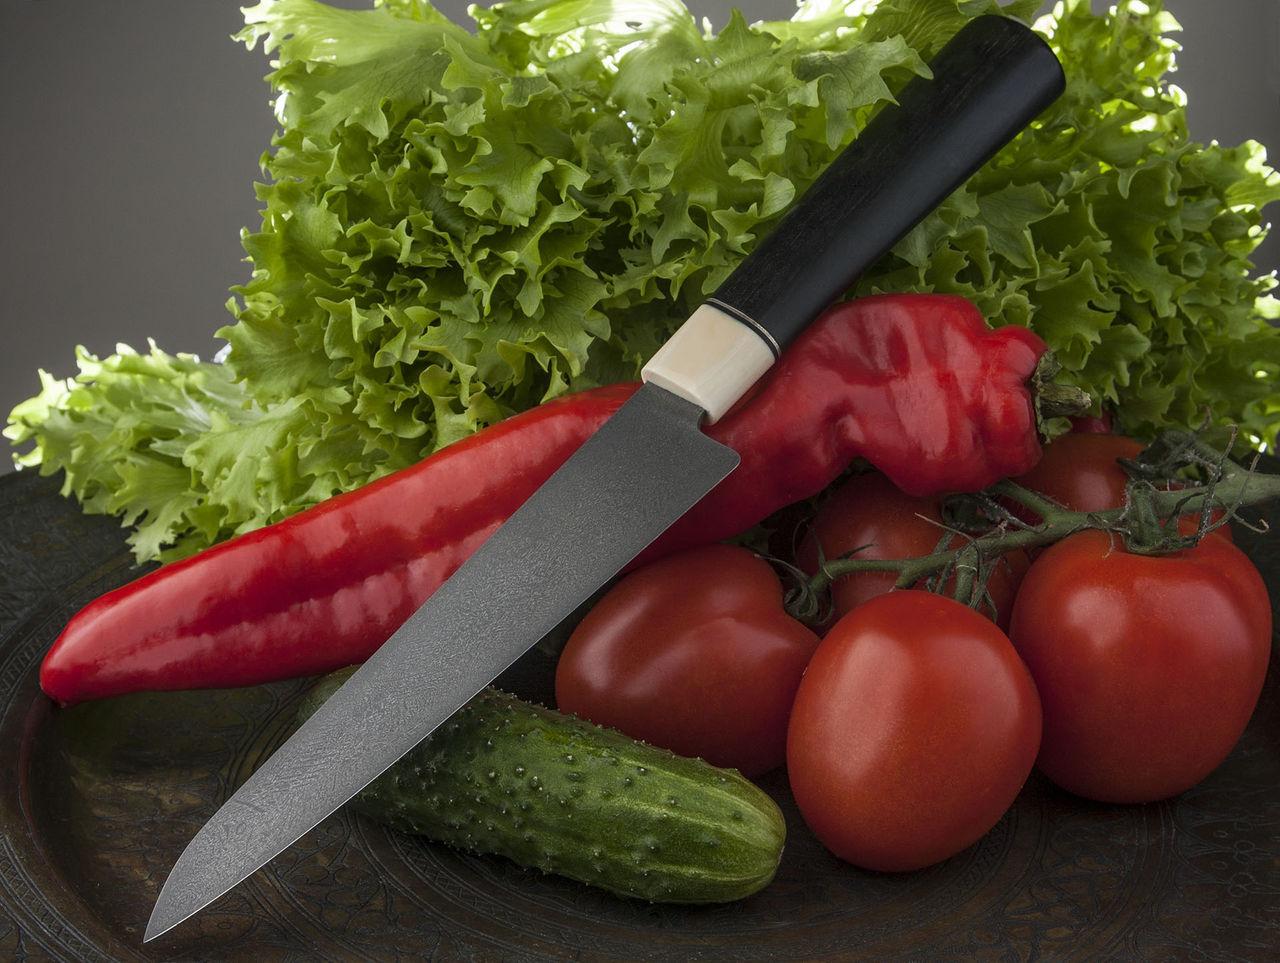 Фото ножа для шинковки